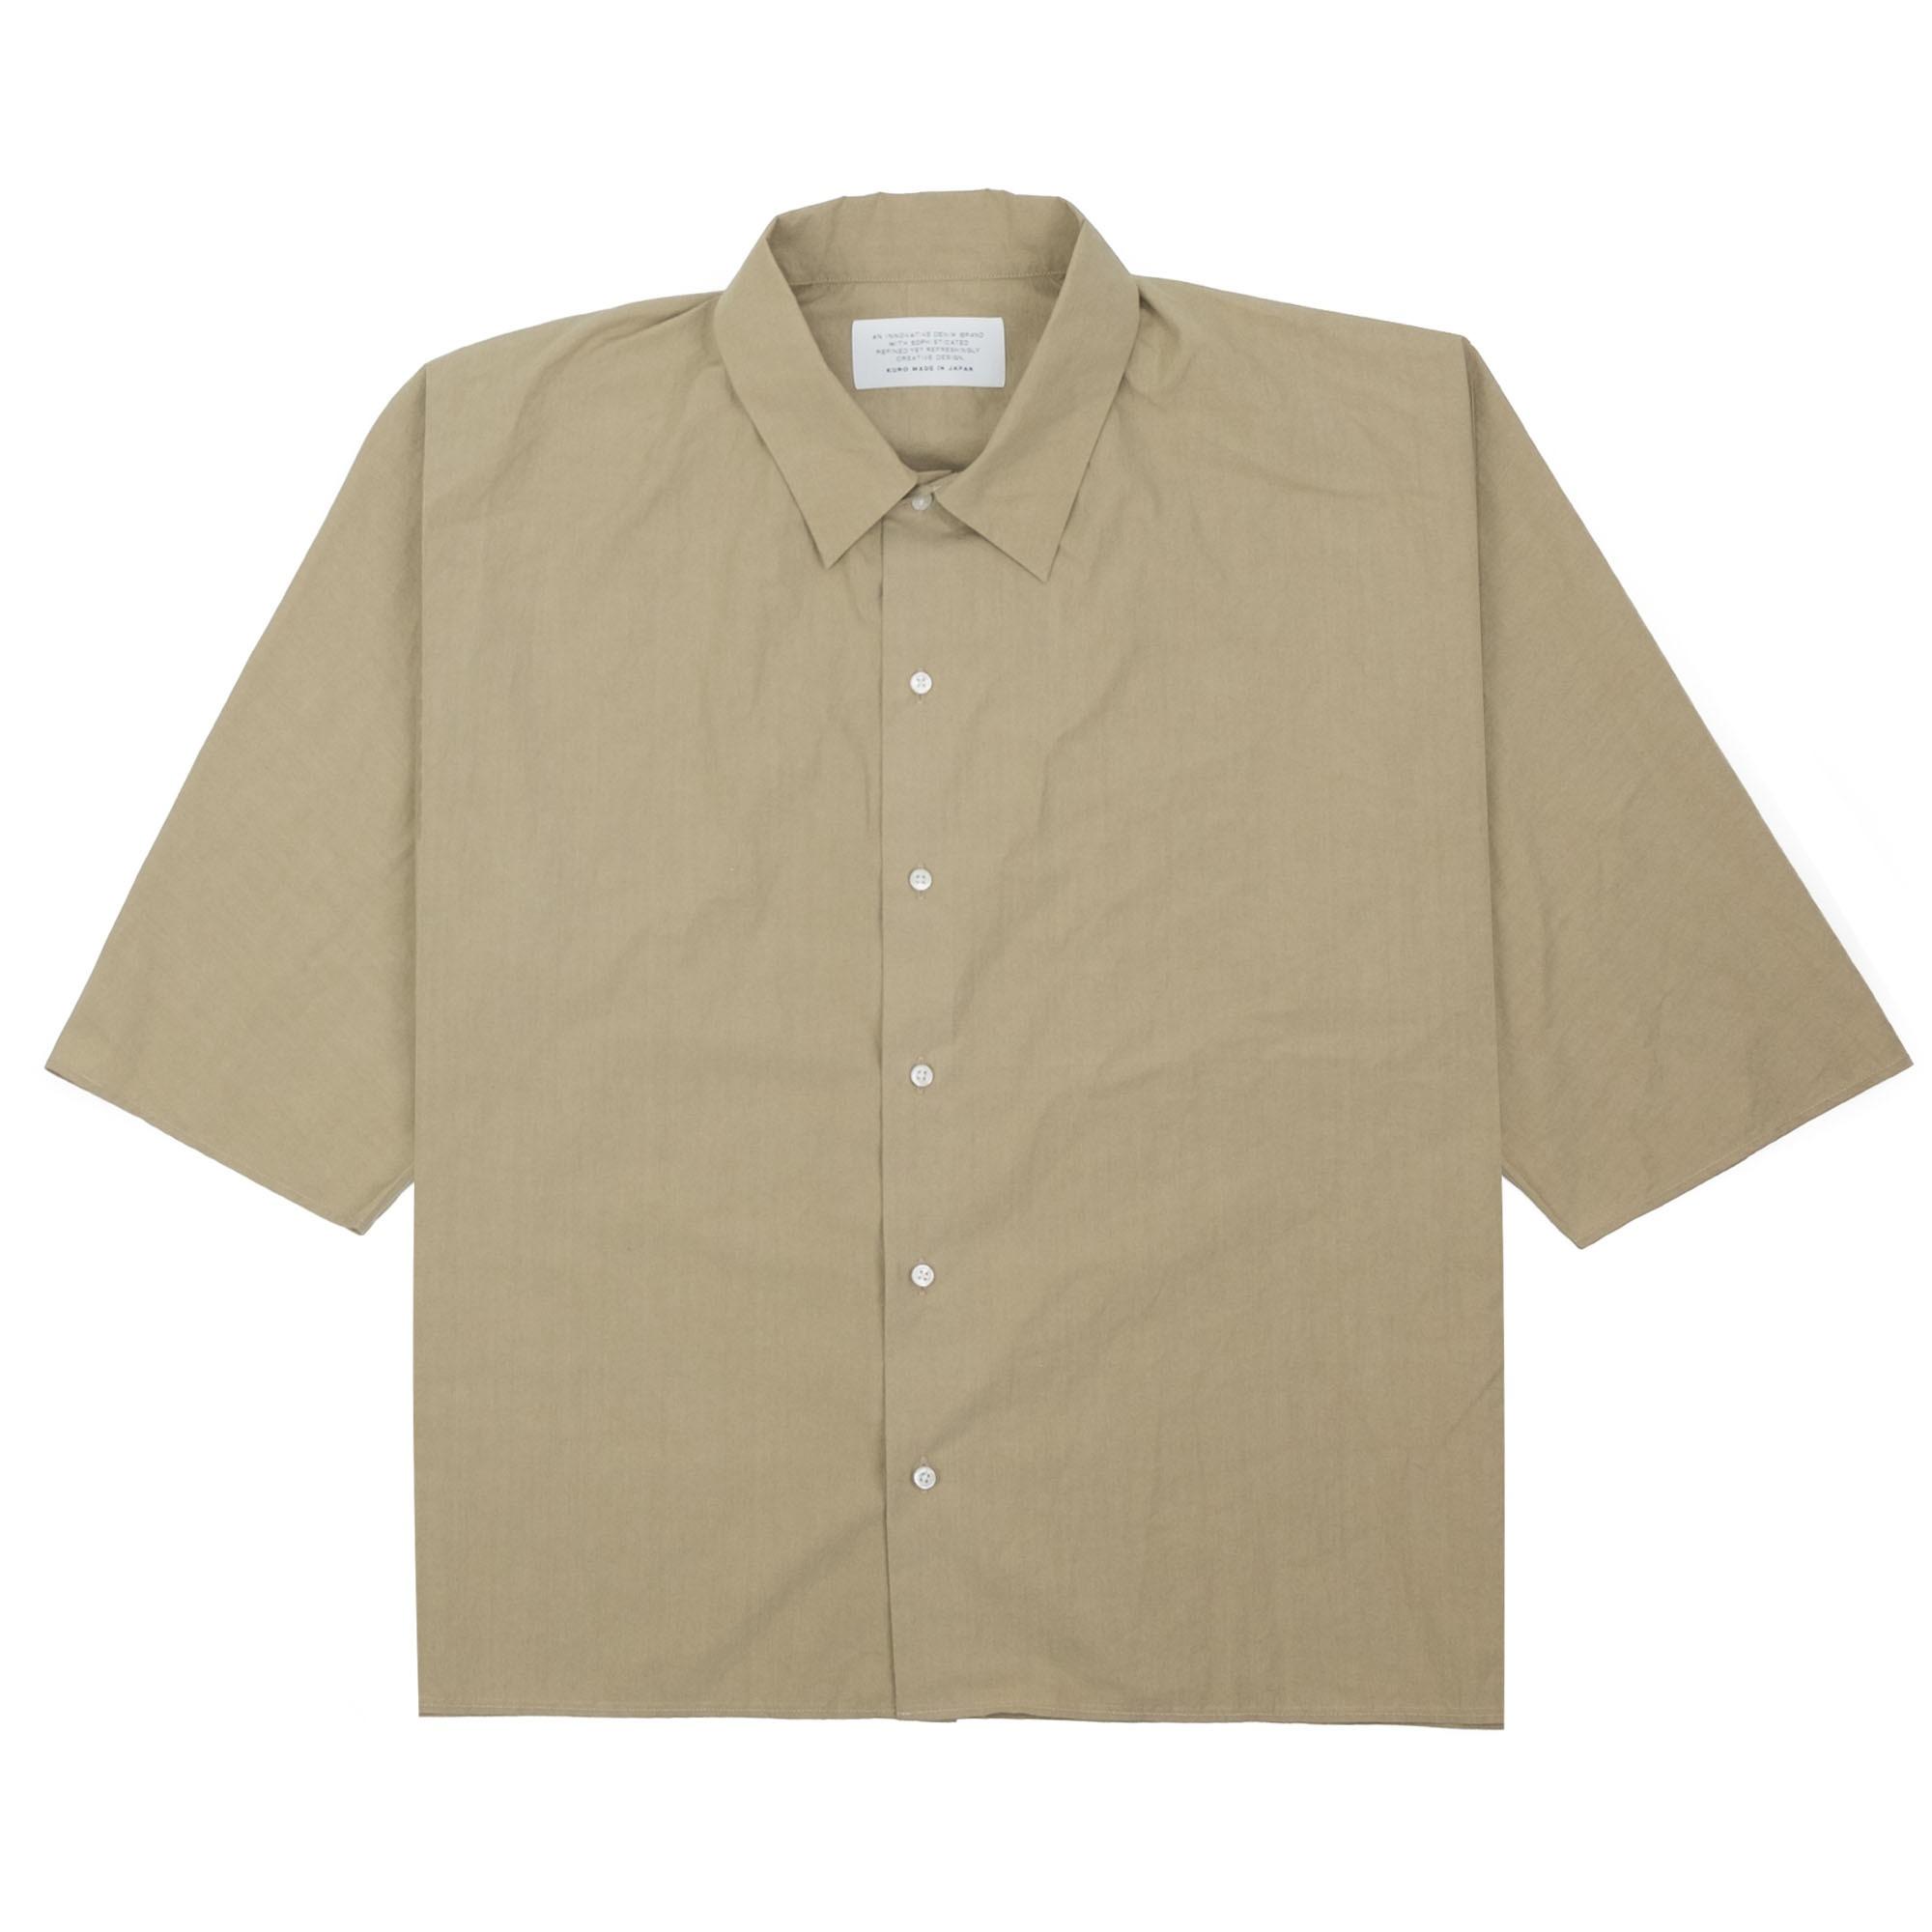 Dolman Sleeve S-S Shirt Beige 1